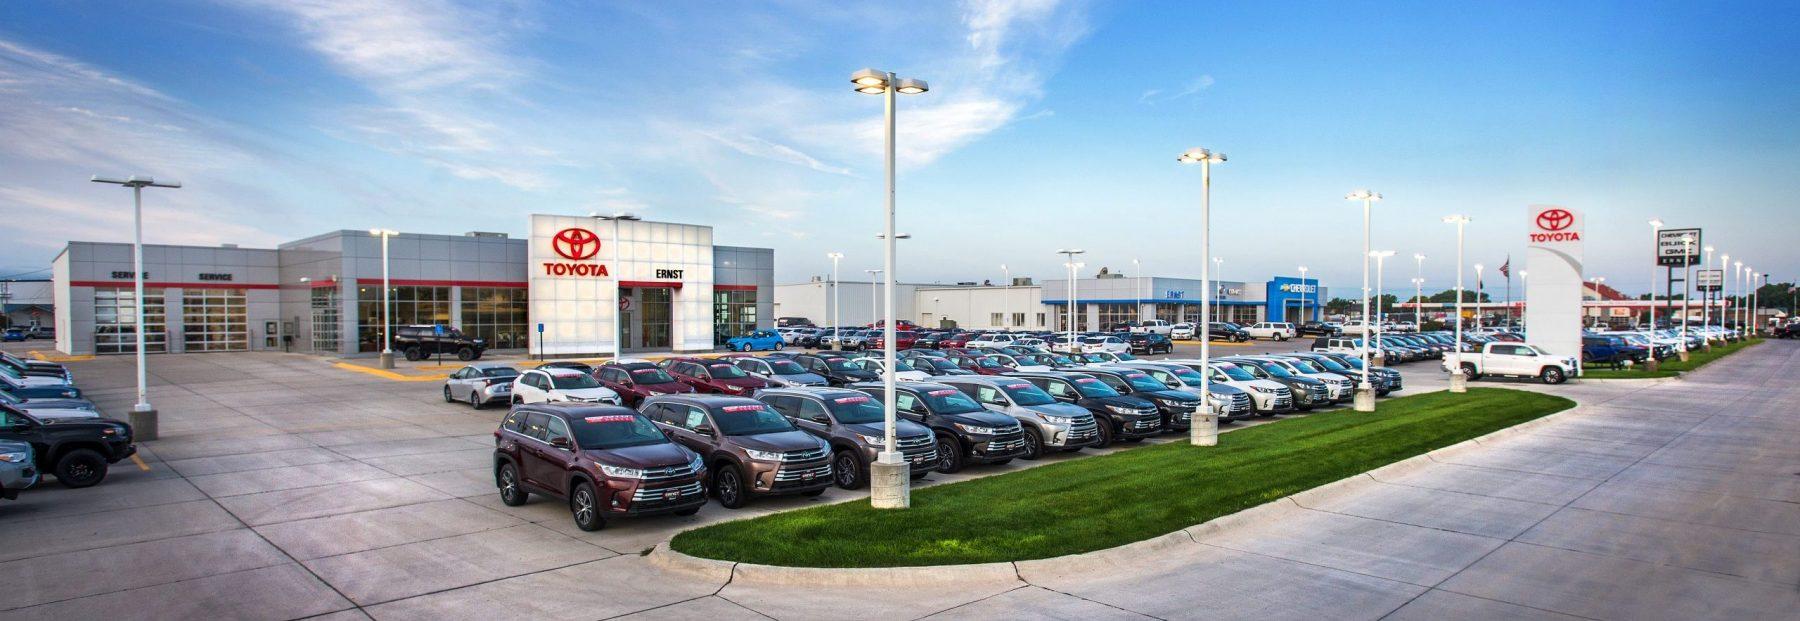 Ernst Auto Group Dealership Image